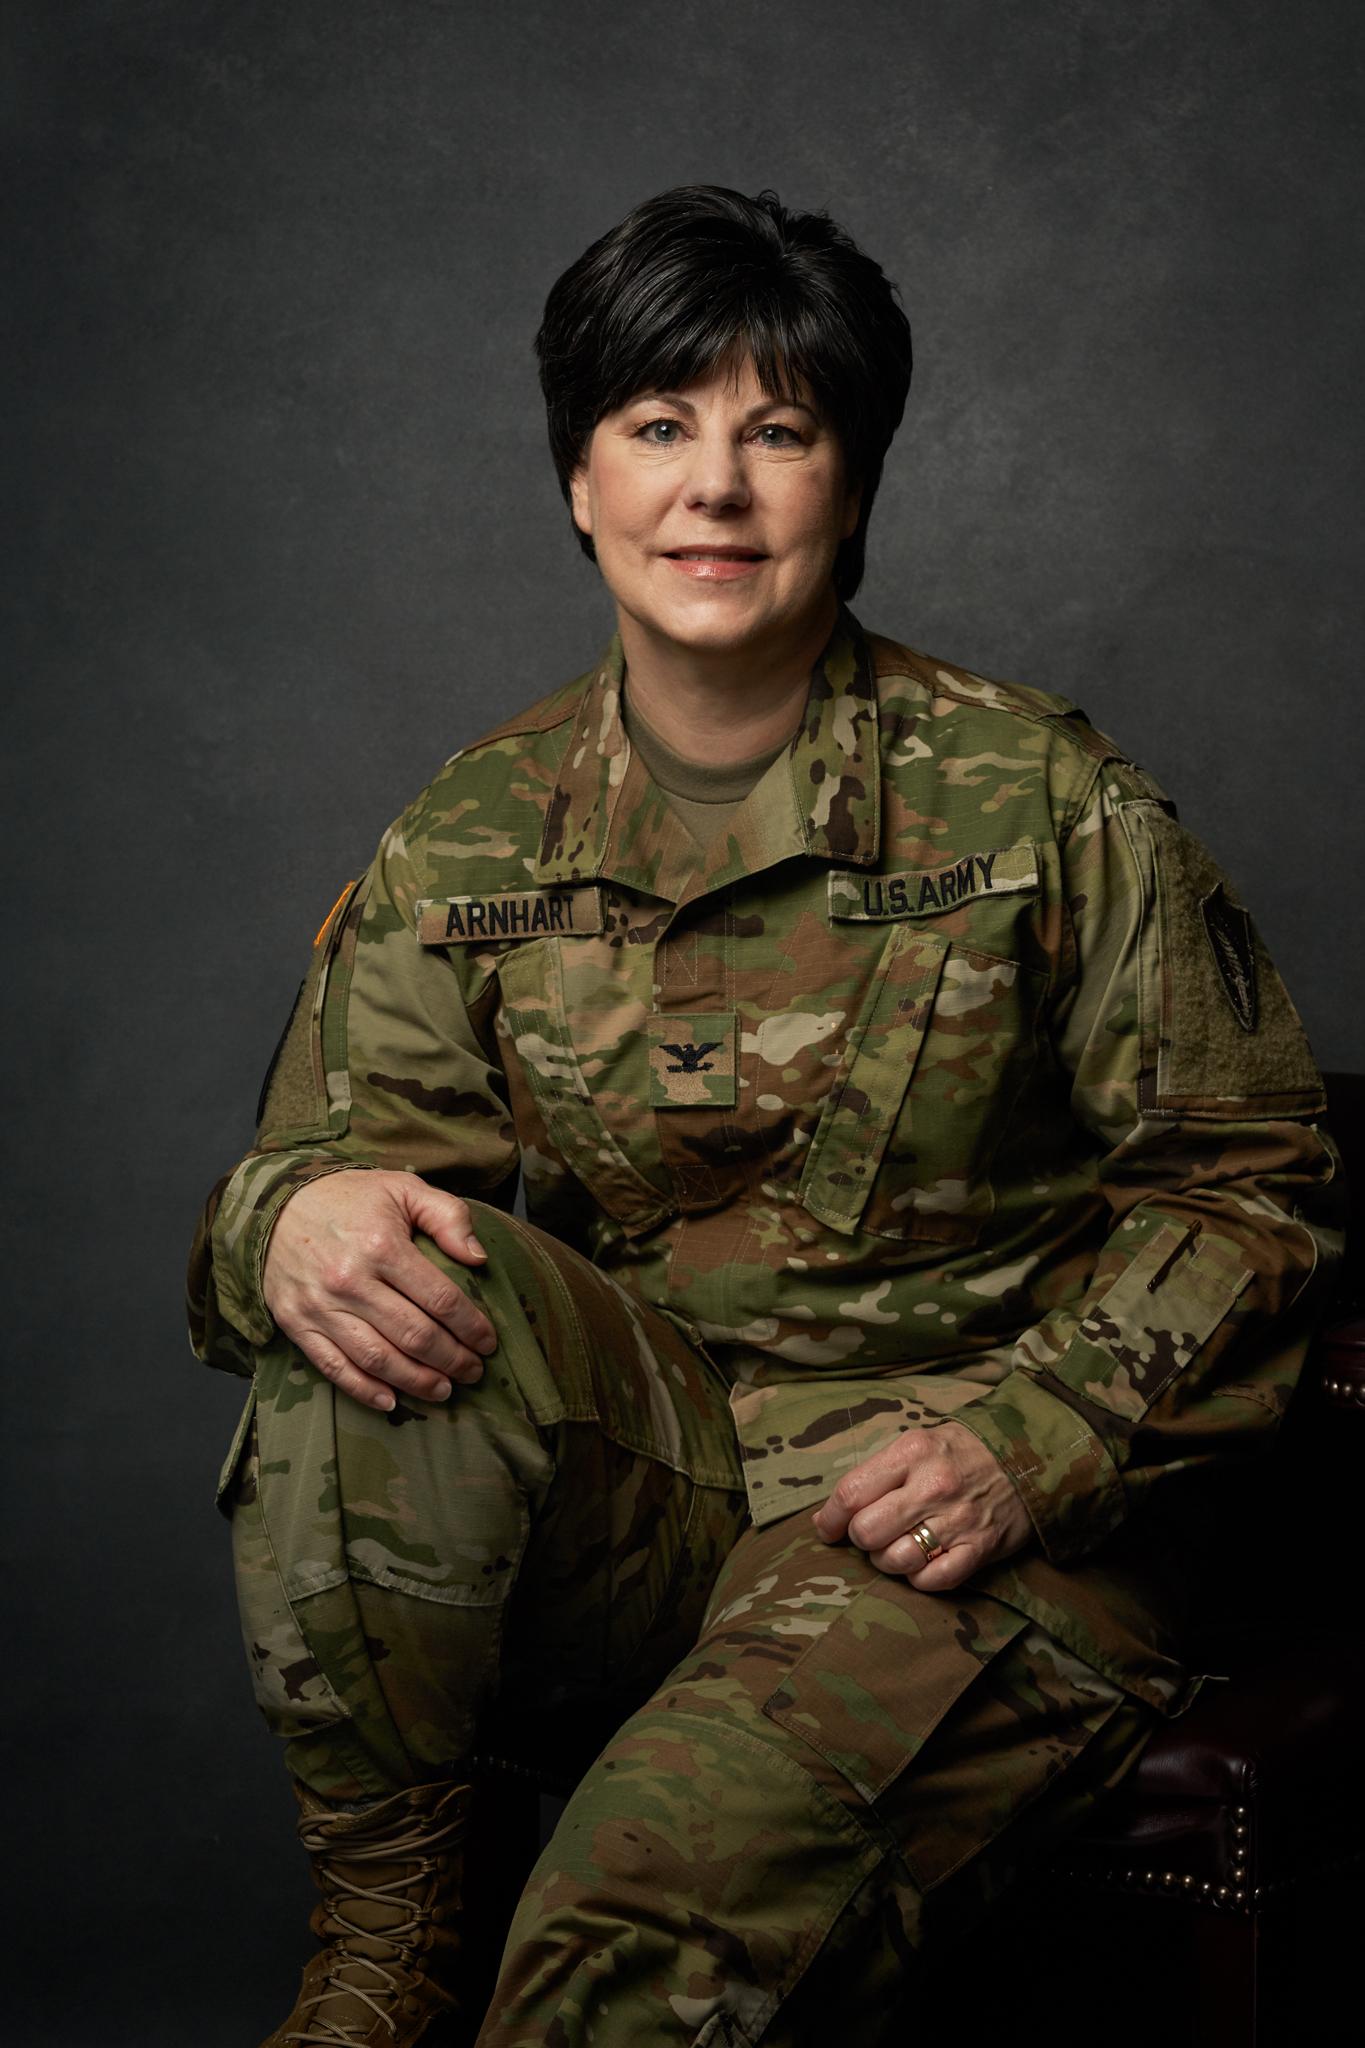 Jenn-McIntyre-Portraits-Lynn-Arnhart-Army4.jpg